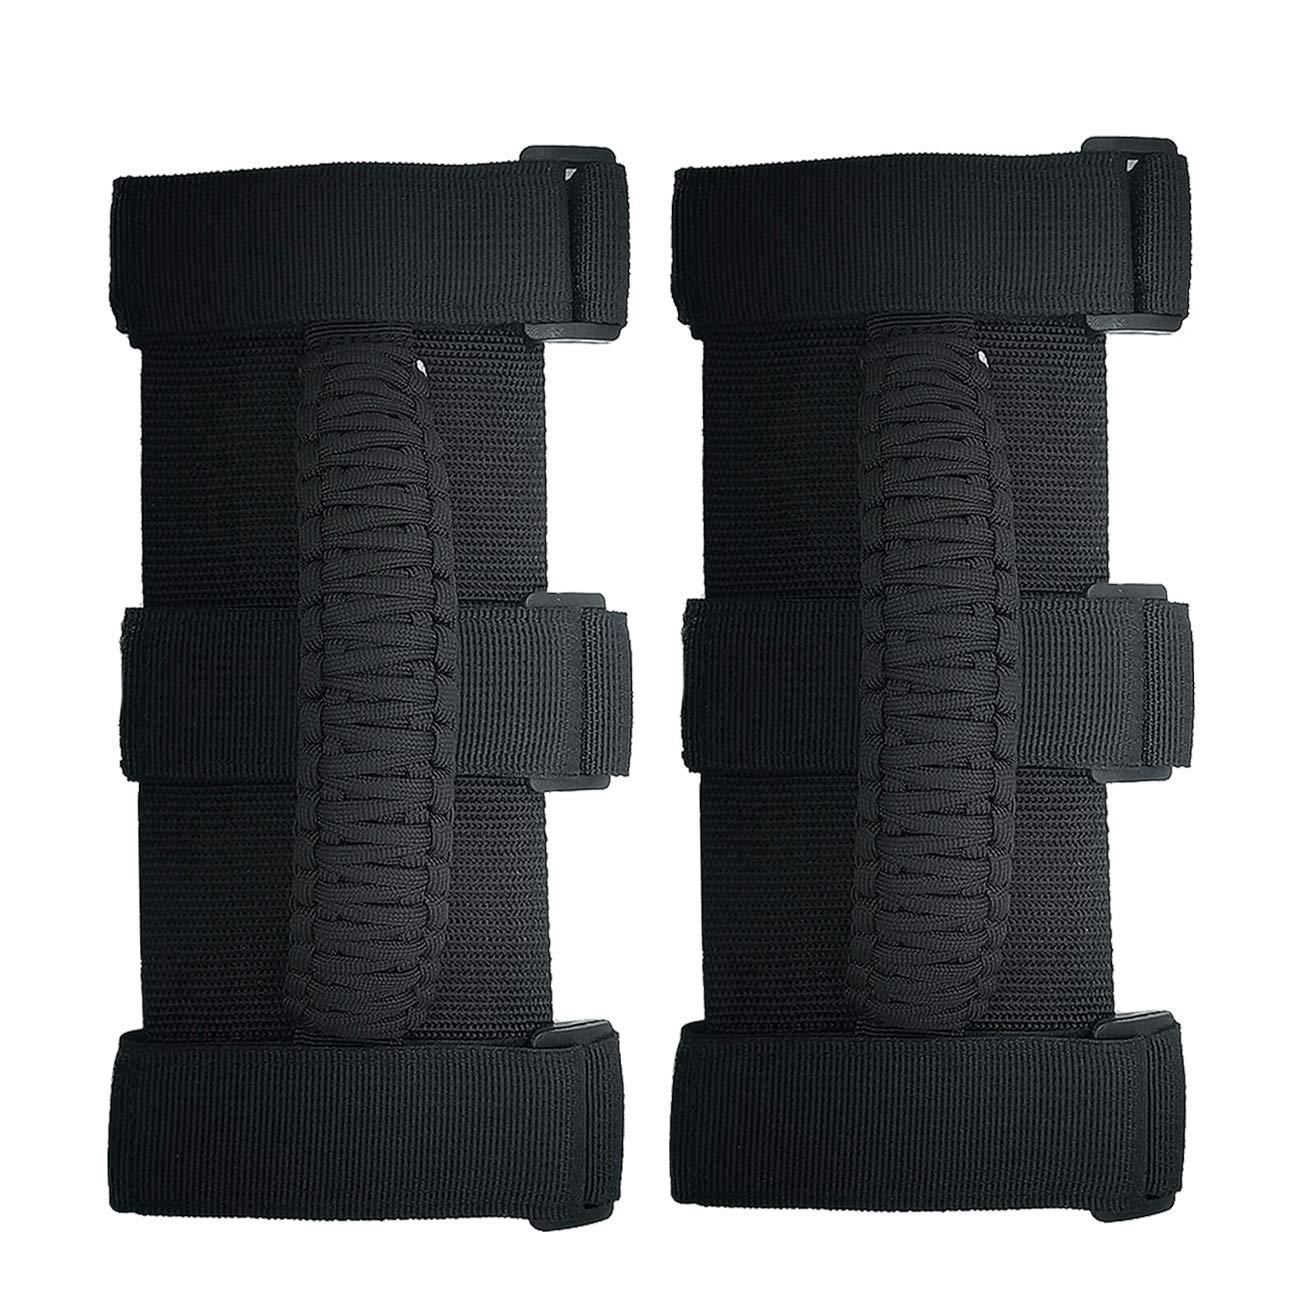 ROMASO 2Pcs Grab Handles for Jeep Wrangler Paracord Black//Olive